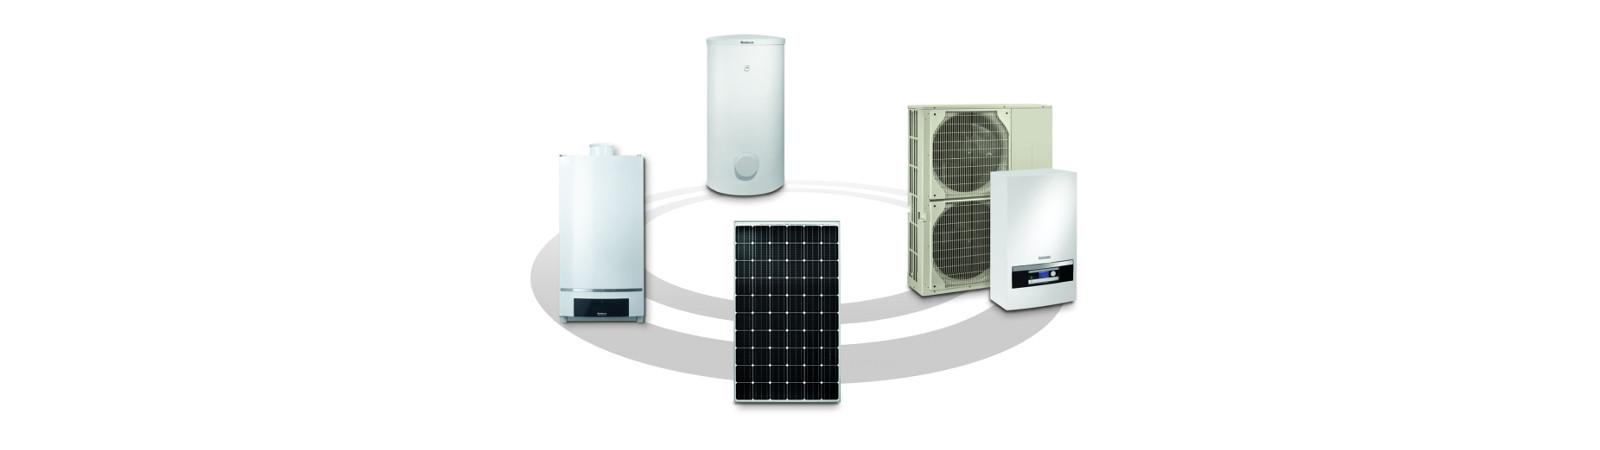 Wärmepumpen Systeme